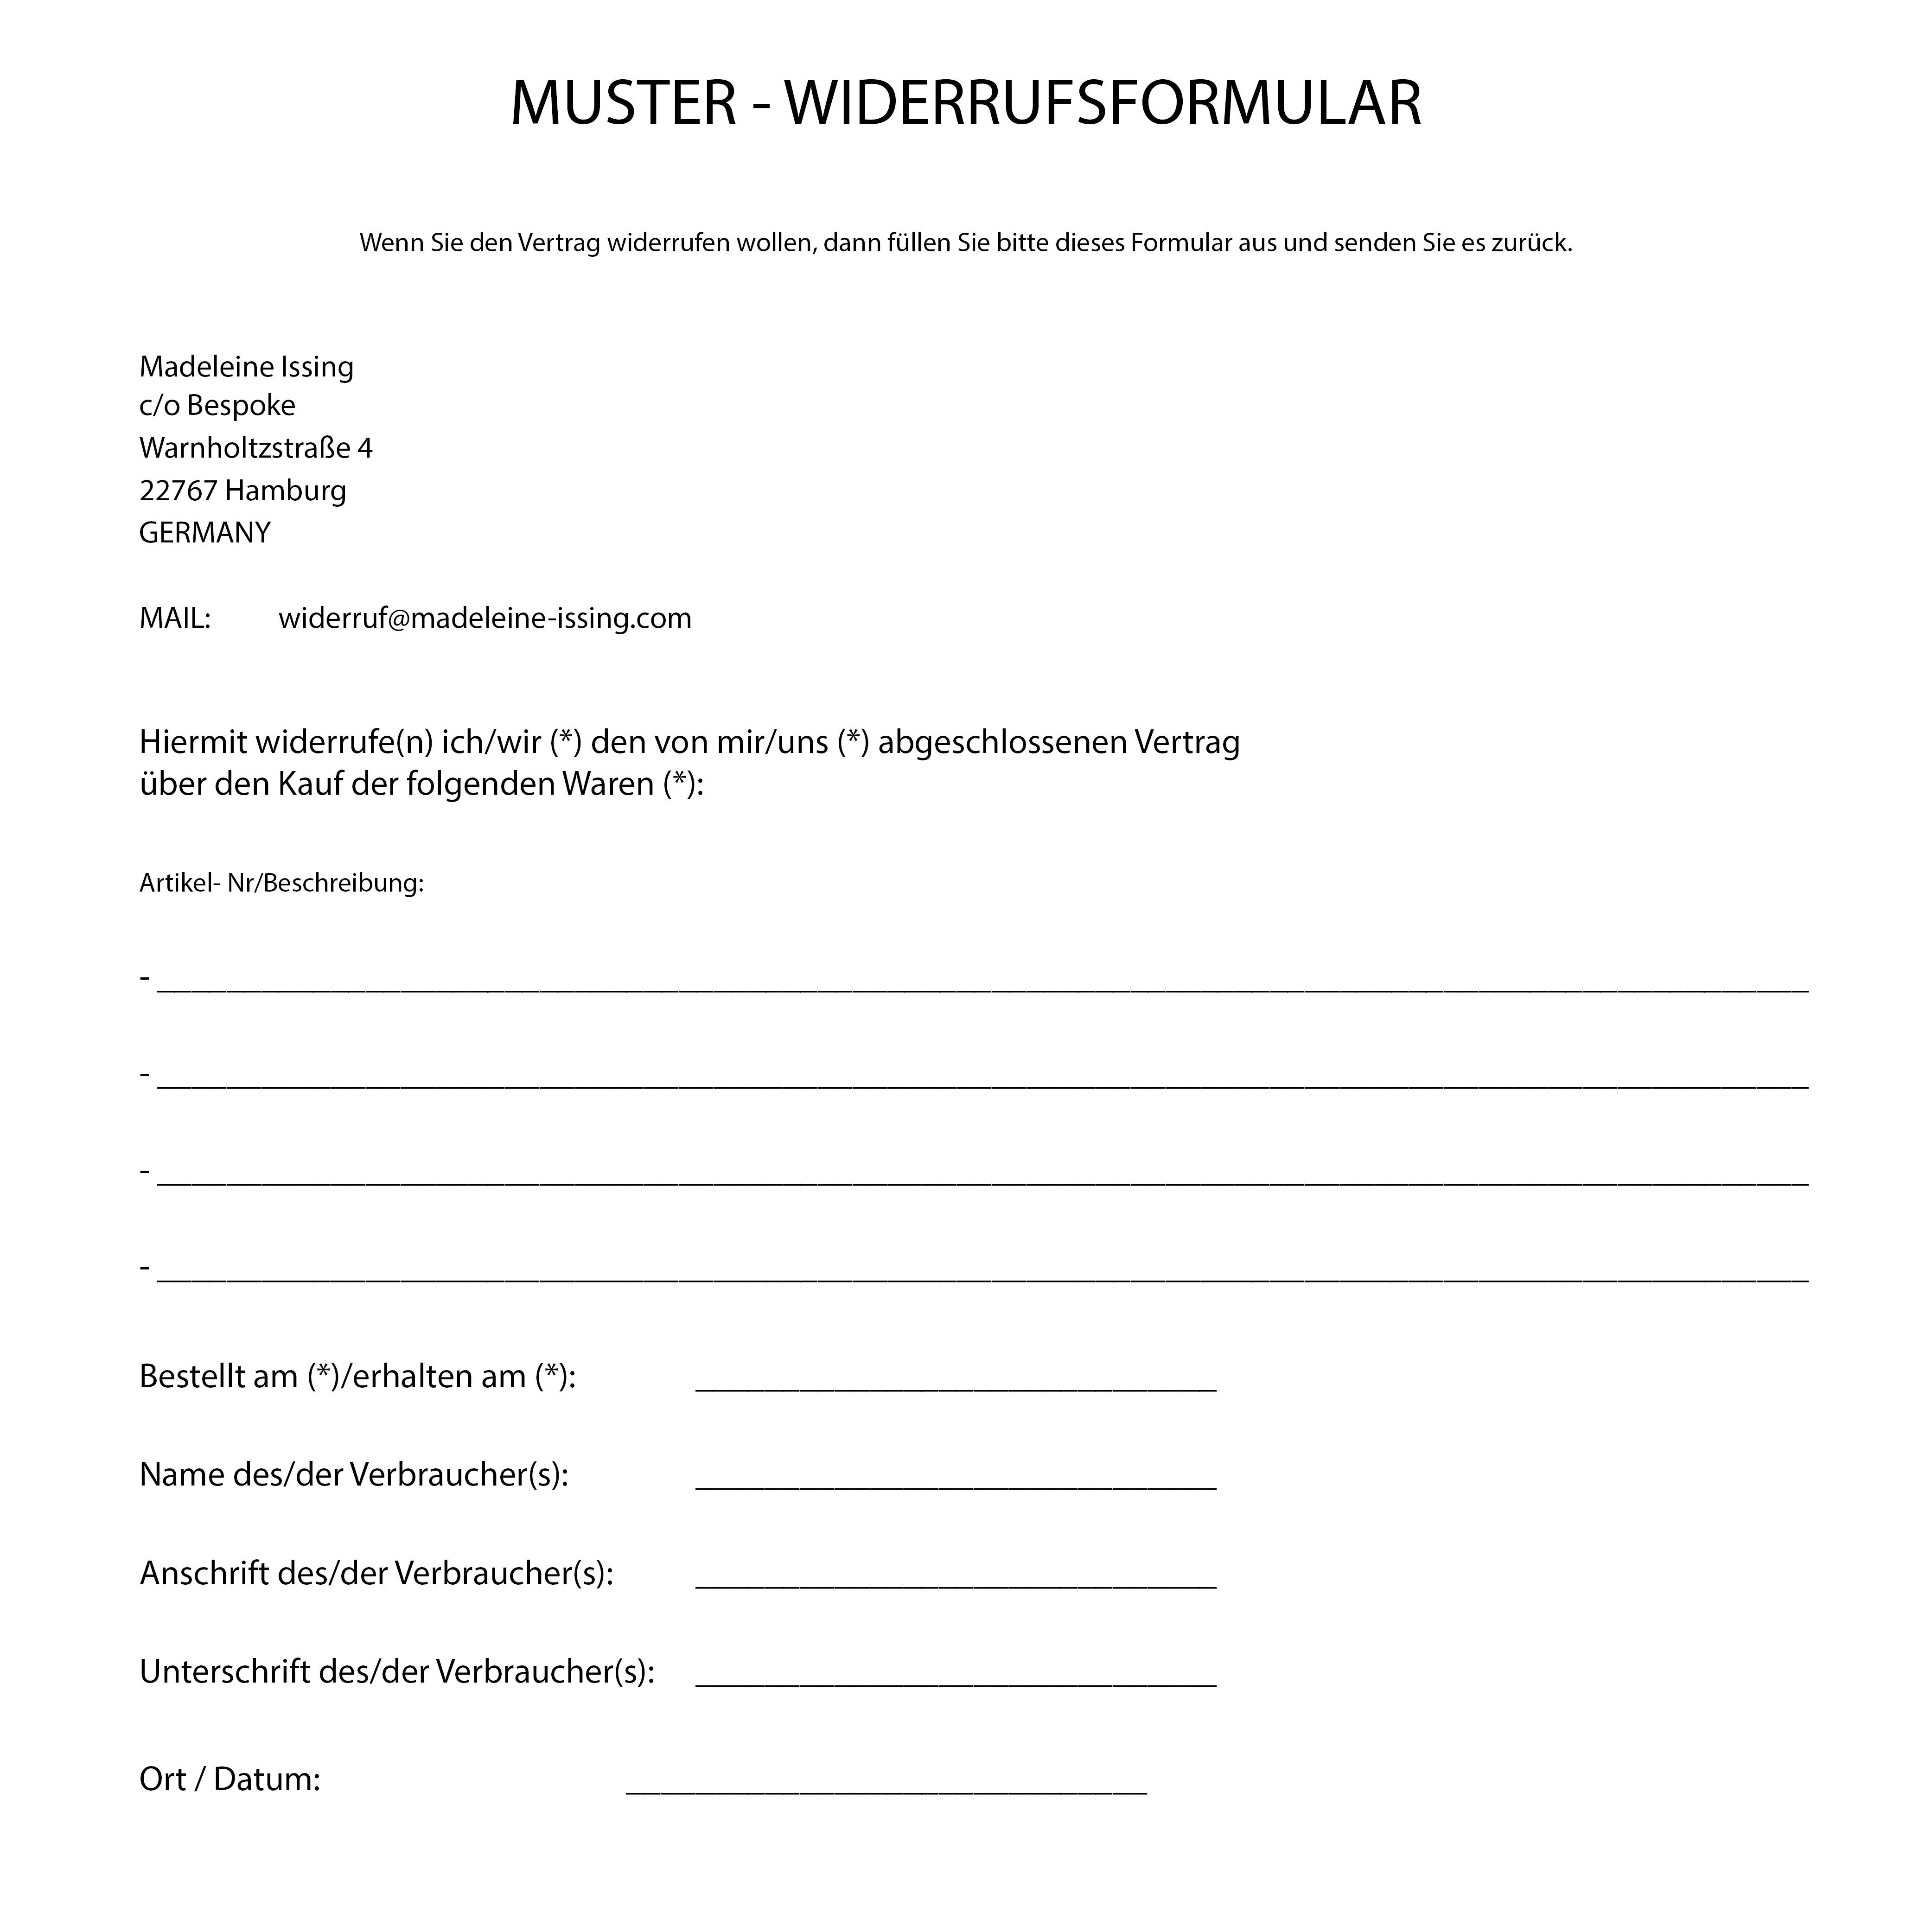 MUSTER-WIDERRUFSFORMULAR Bespoke_2